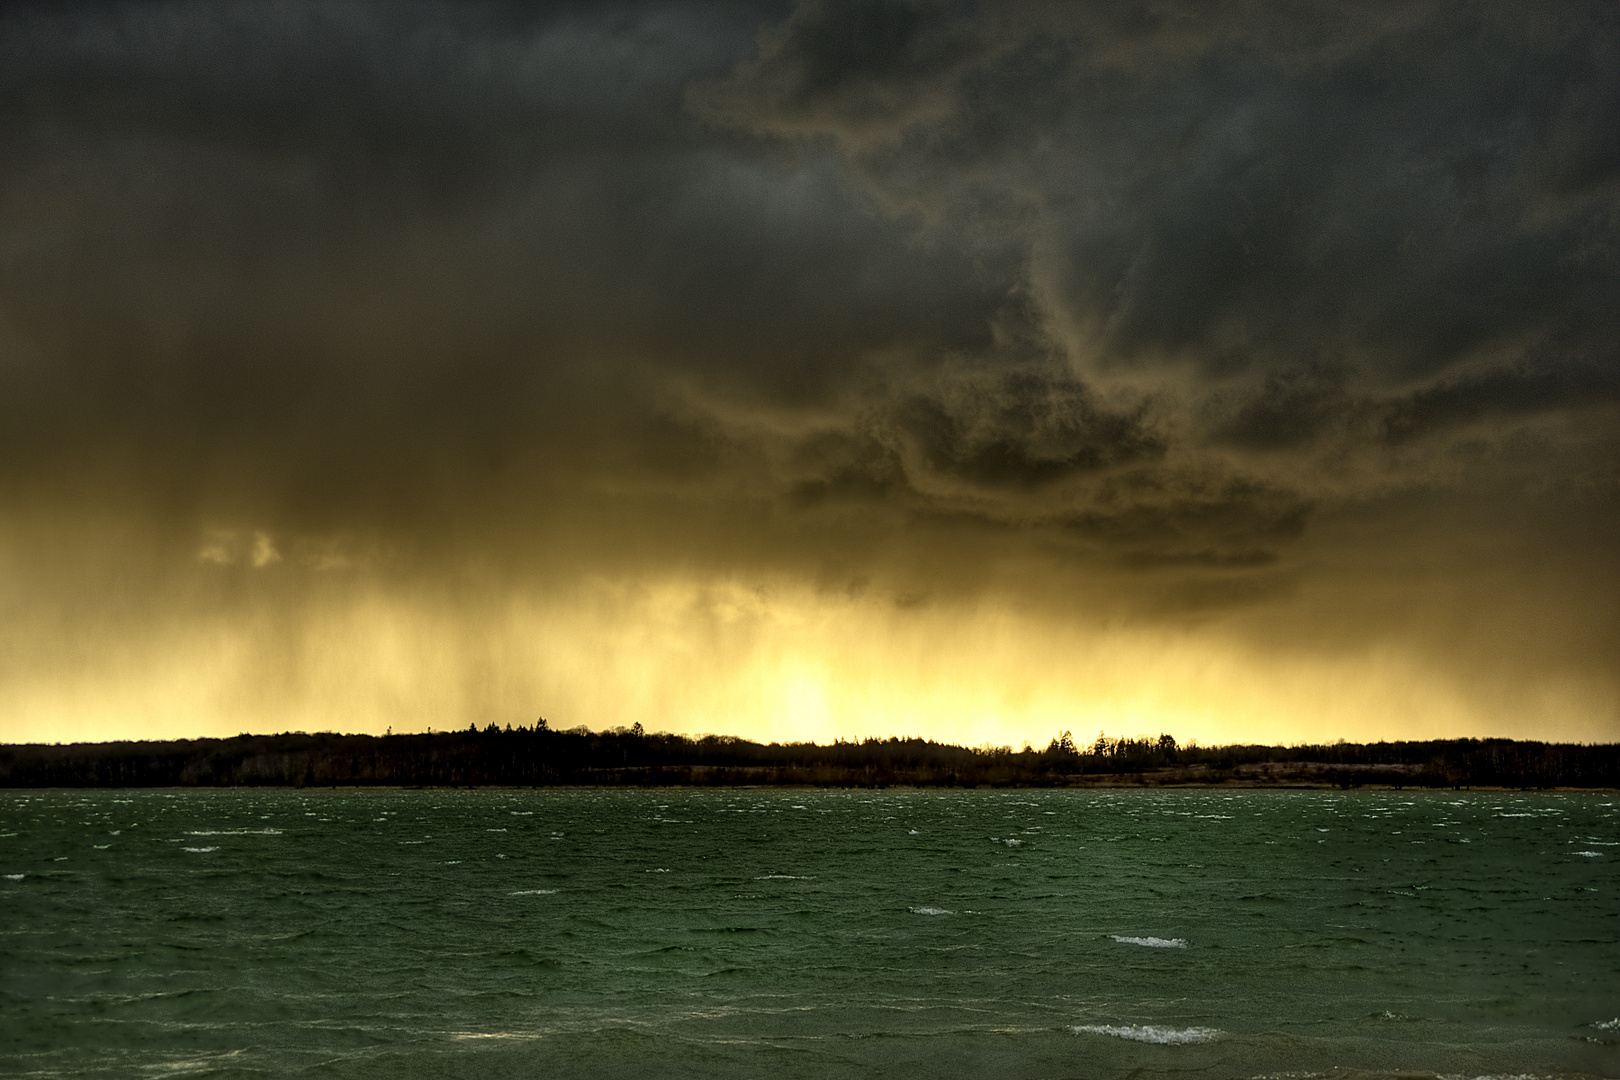 Un rideau de pluie